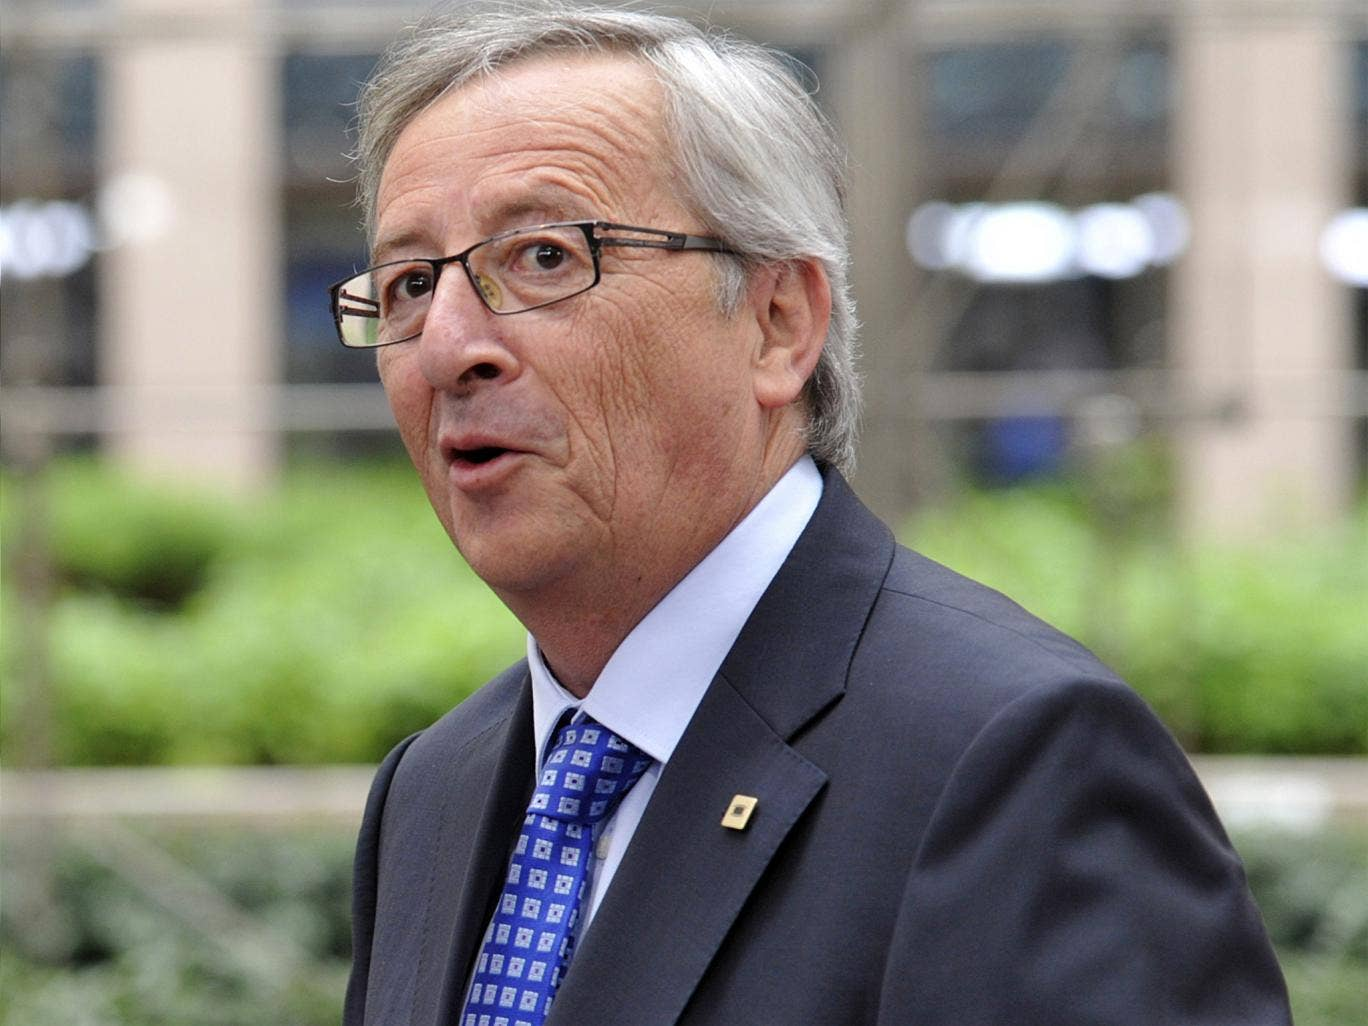 Jean-Claude Juncker has key allies in his bid to be EU Commission president